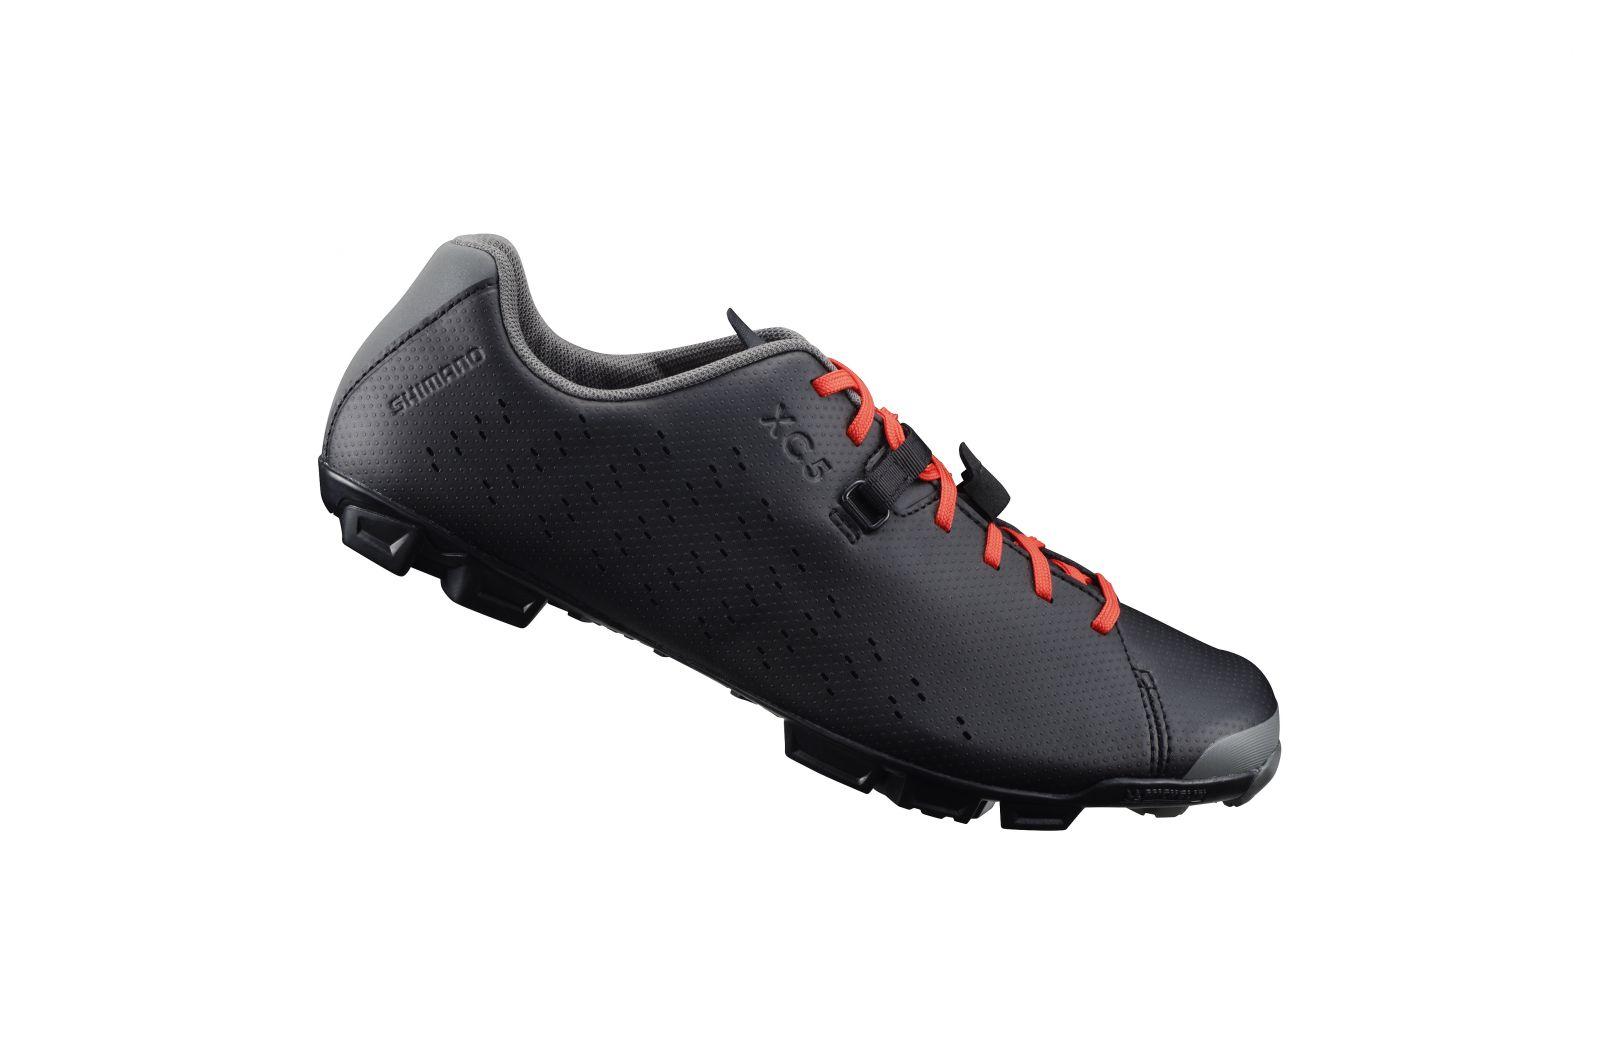 SHIMANO MTB obuv SH-XC500ML, černá, 47